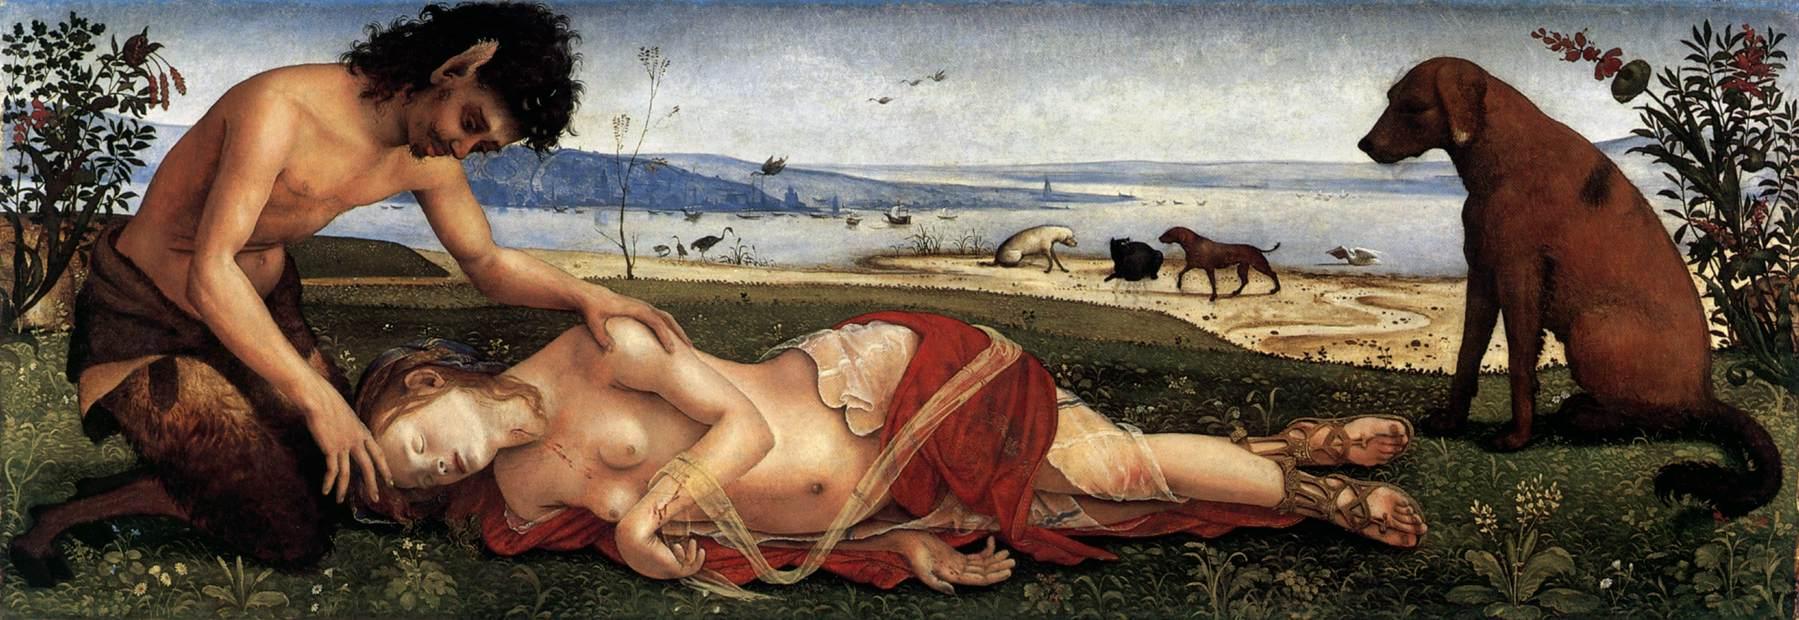 Piero di Cosimo, The Death of Procris  c. 1500 Oil on panel, 65 x 183 cm